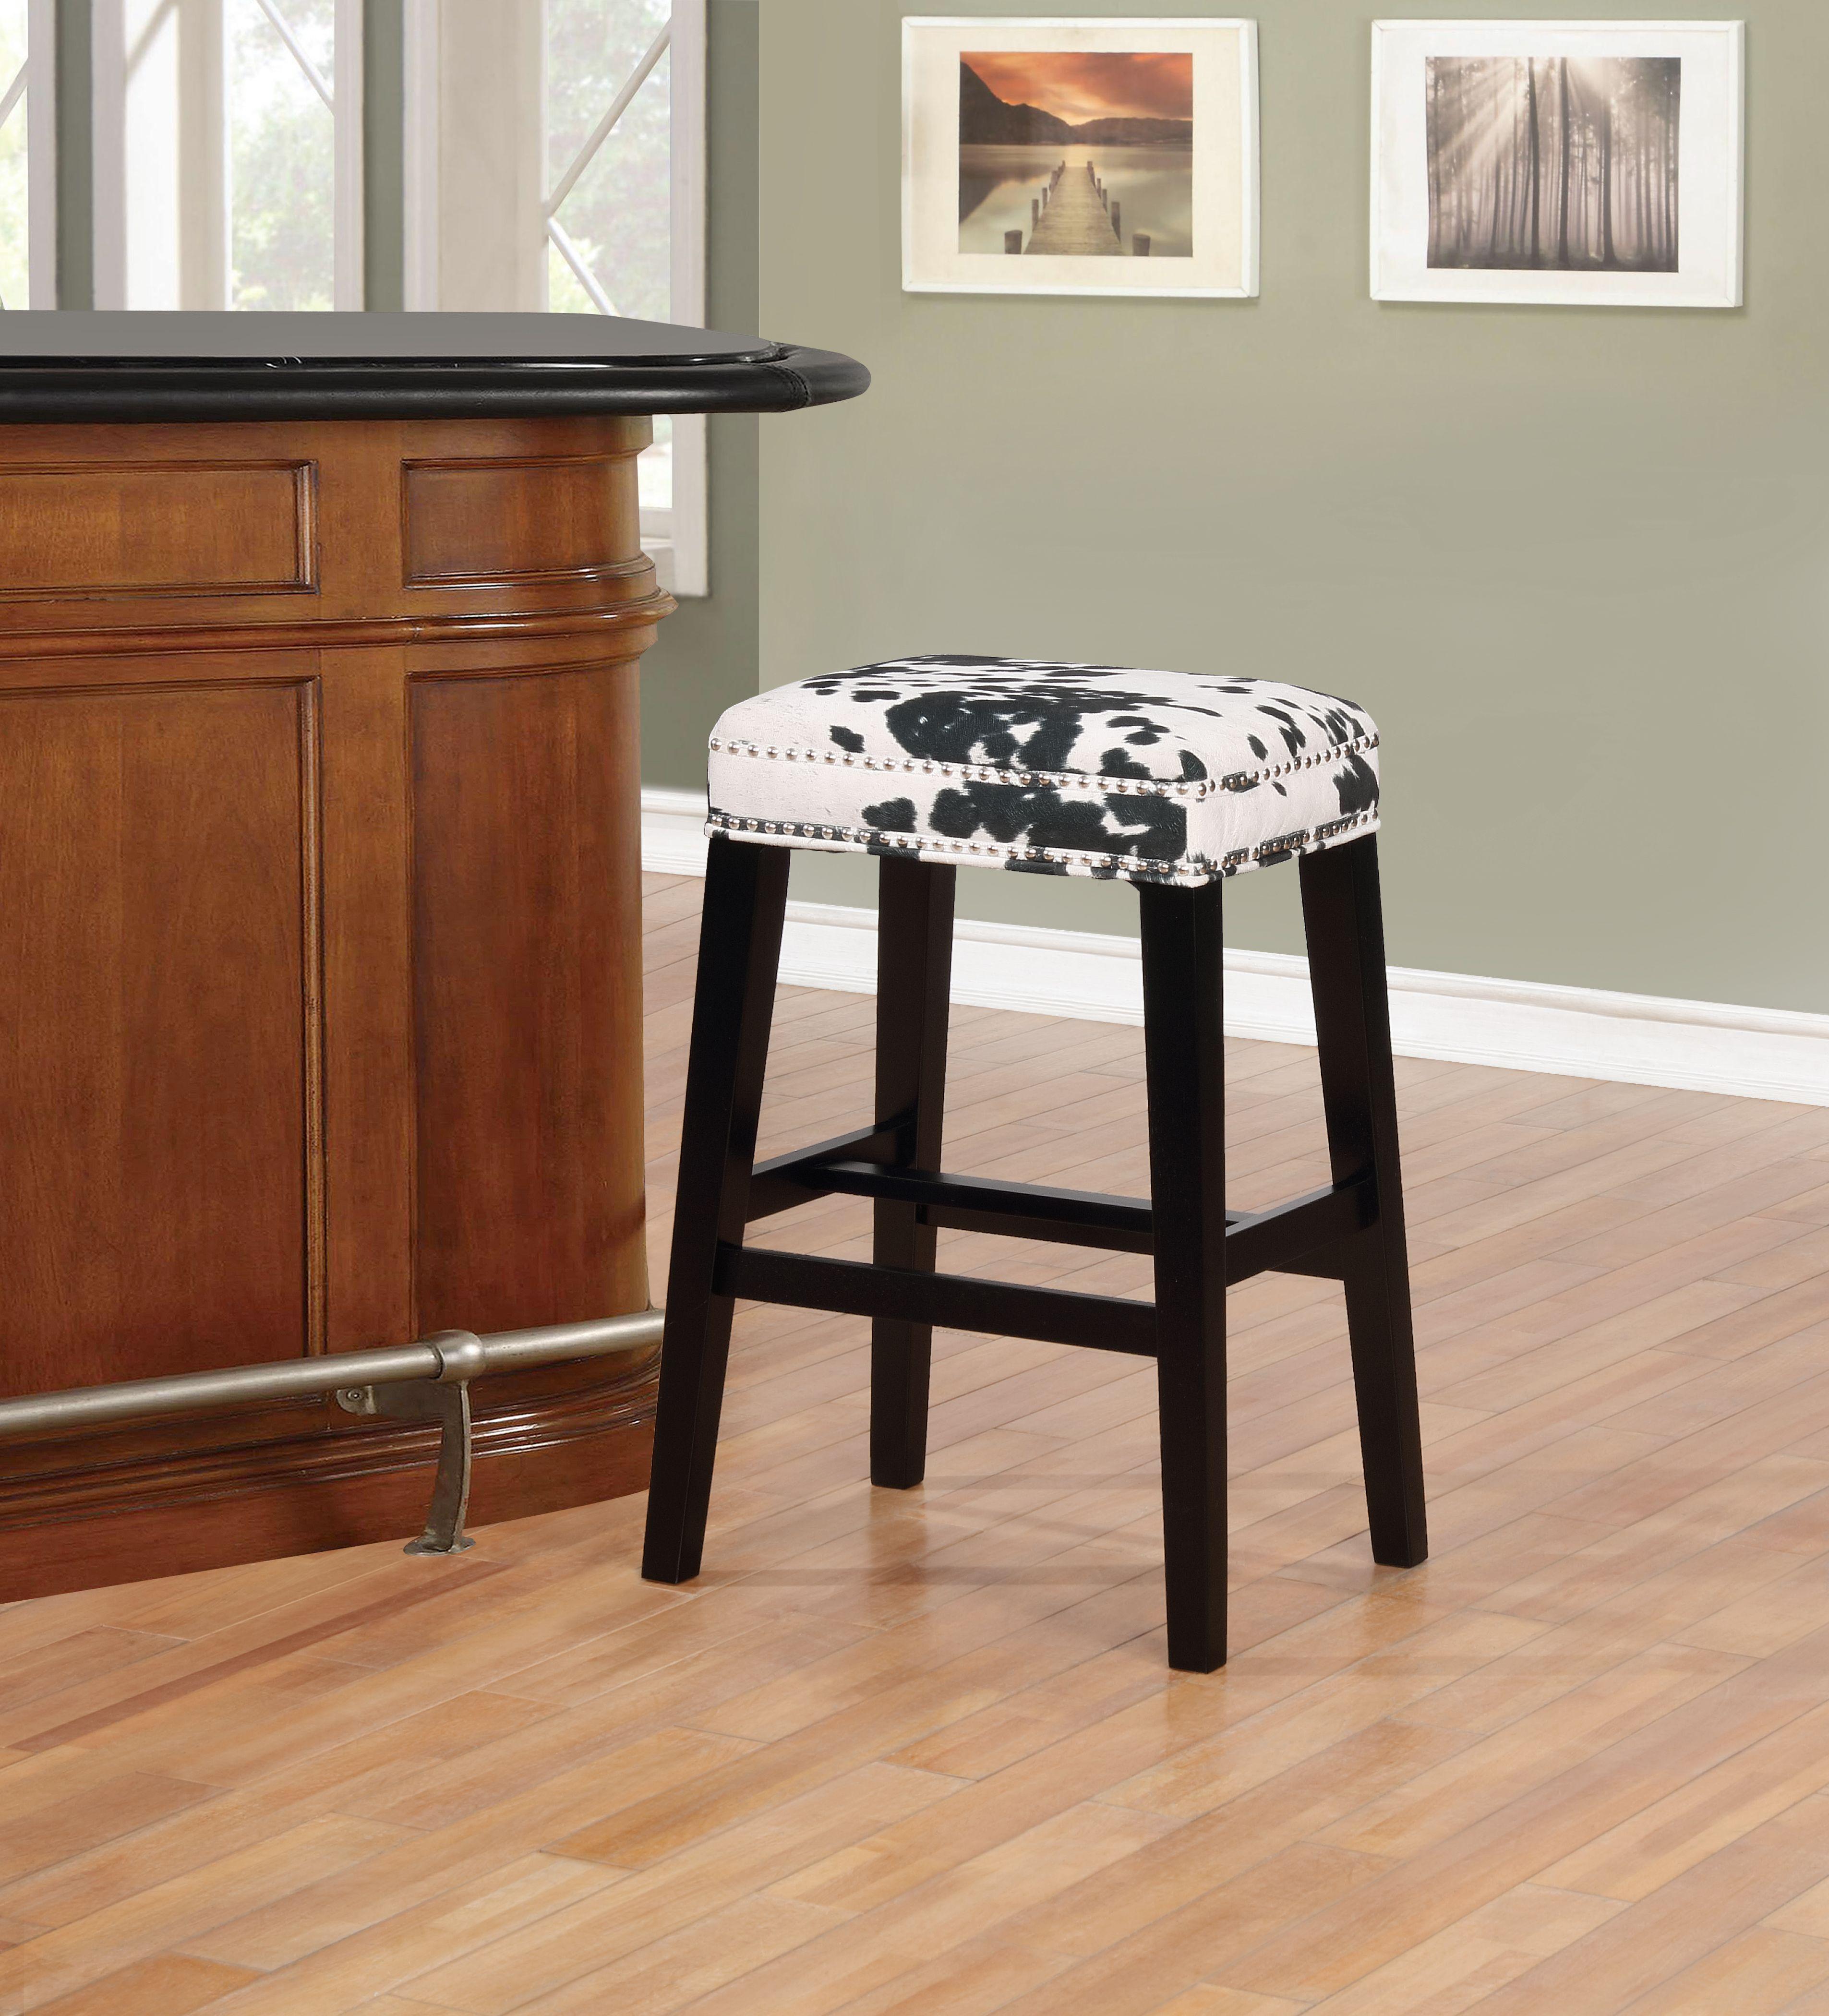 Miraculous Linon Walt Black Cow Print Bar Stool Multi Products Dailytribune Chair Design For Home Dailytribuneorg